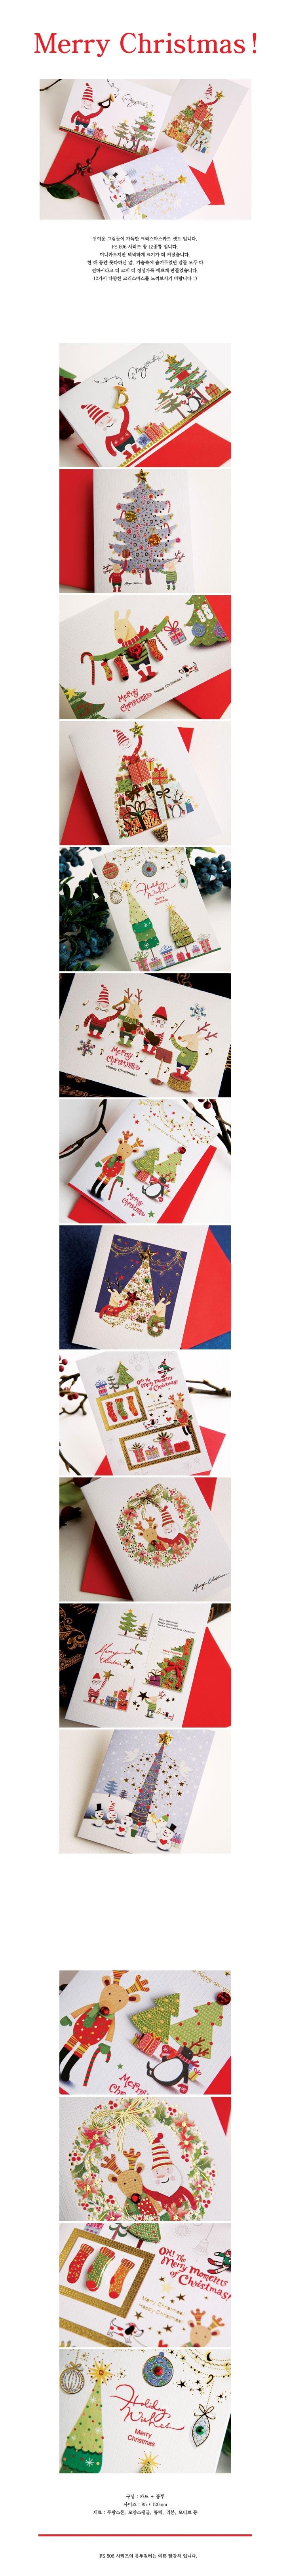 FS506(12종) 크리스마스카드 카드 성탄카드 산타카드 트리카드 - 프롬앤투, 6,000원, 카드, 크리스마스 카드